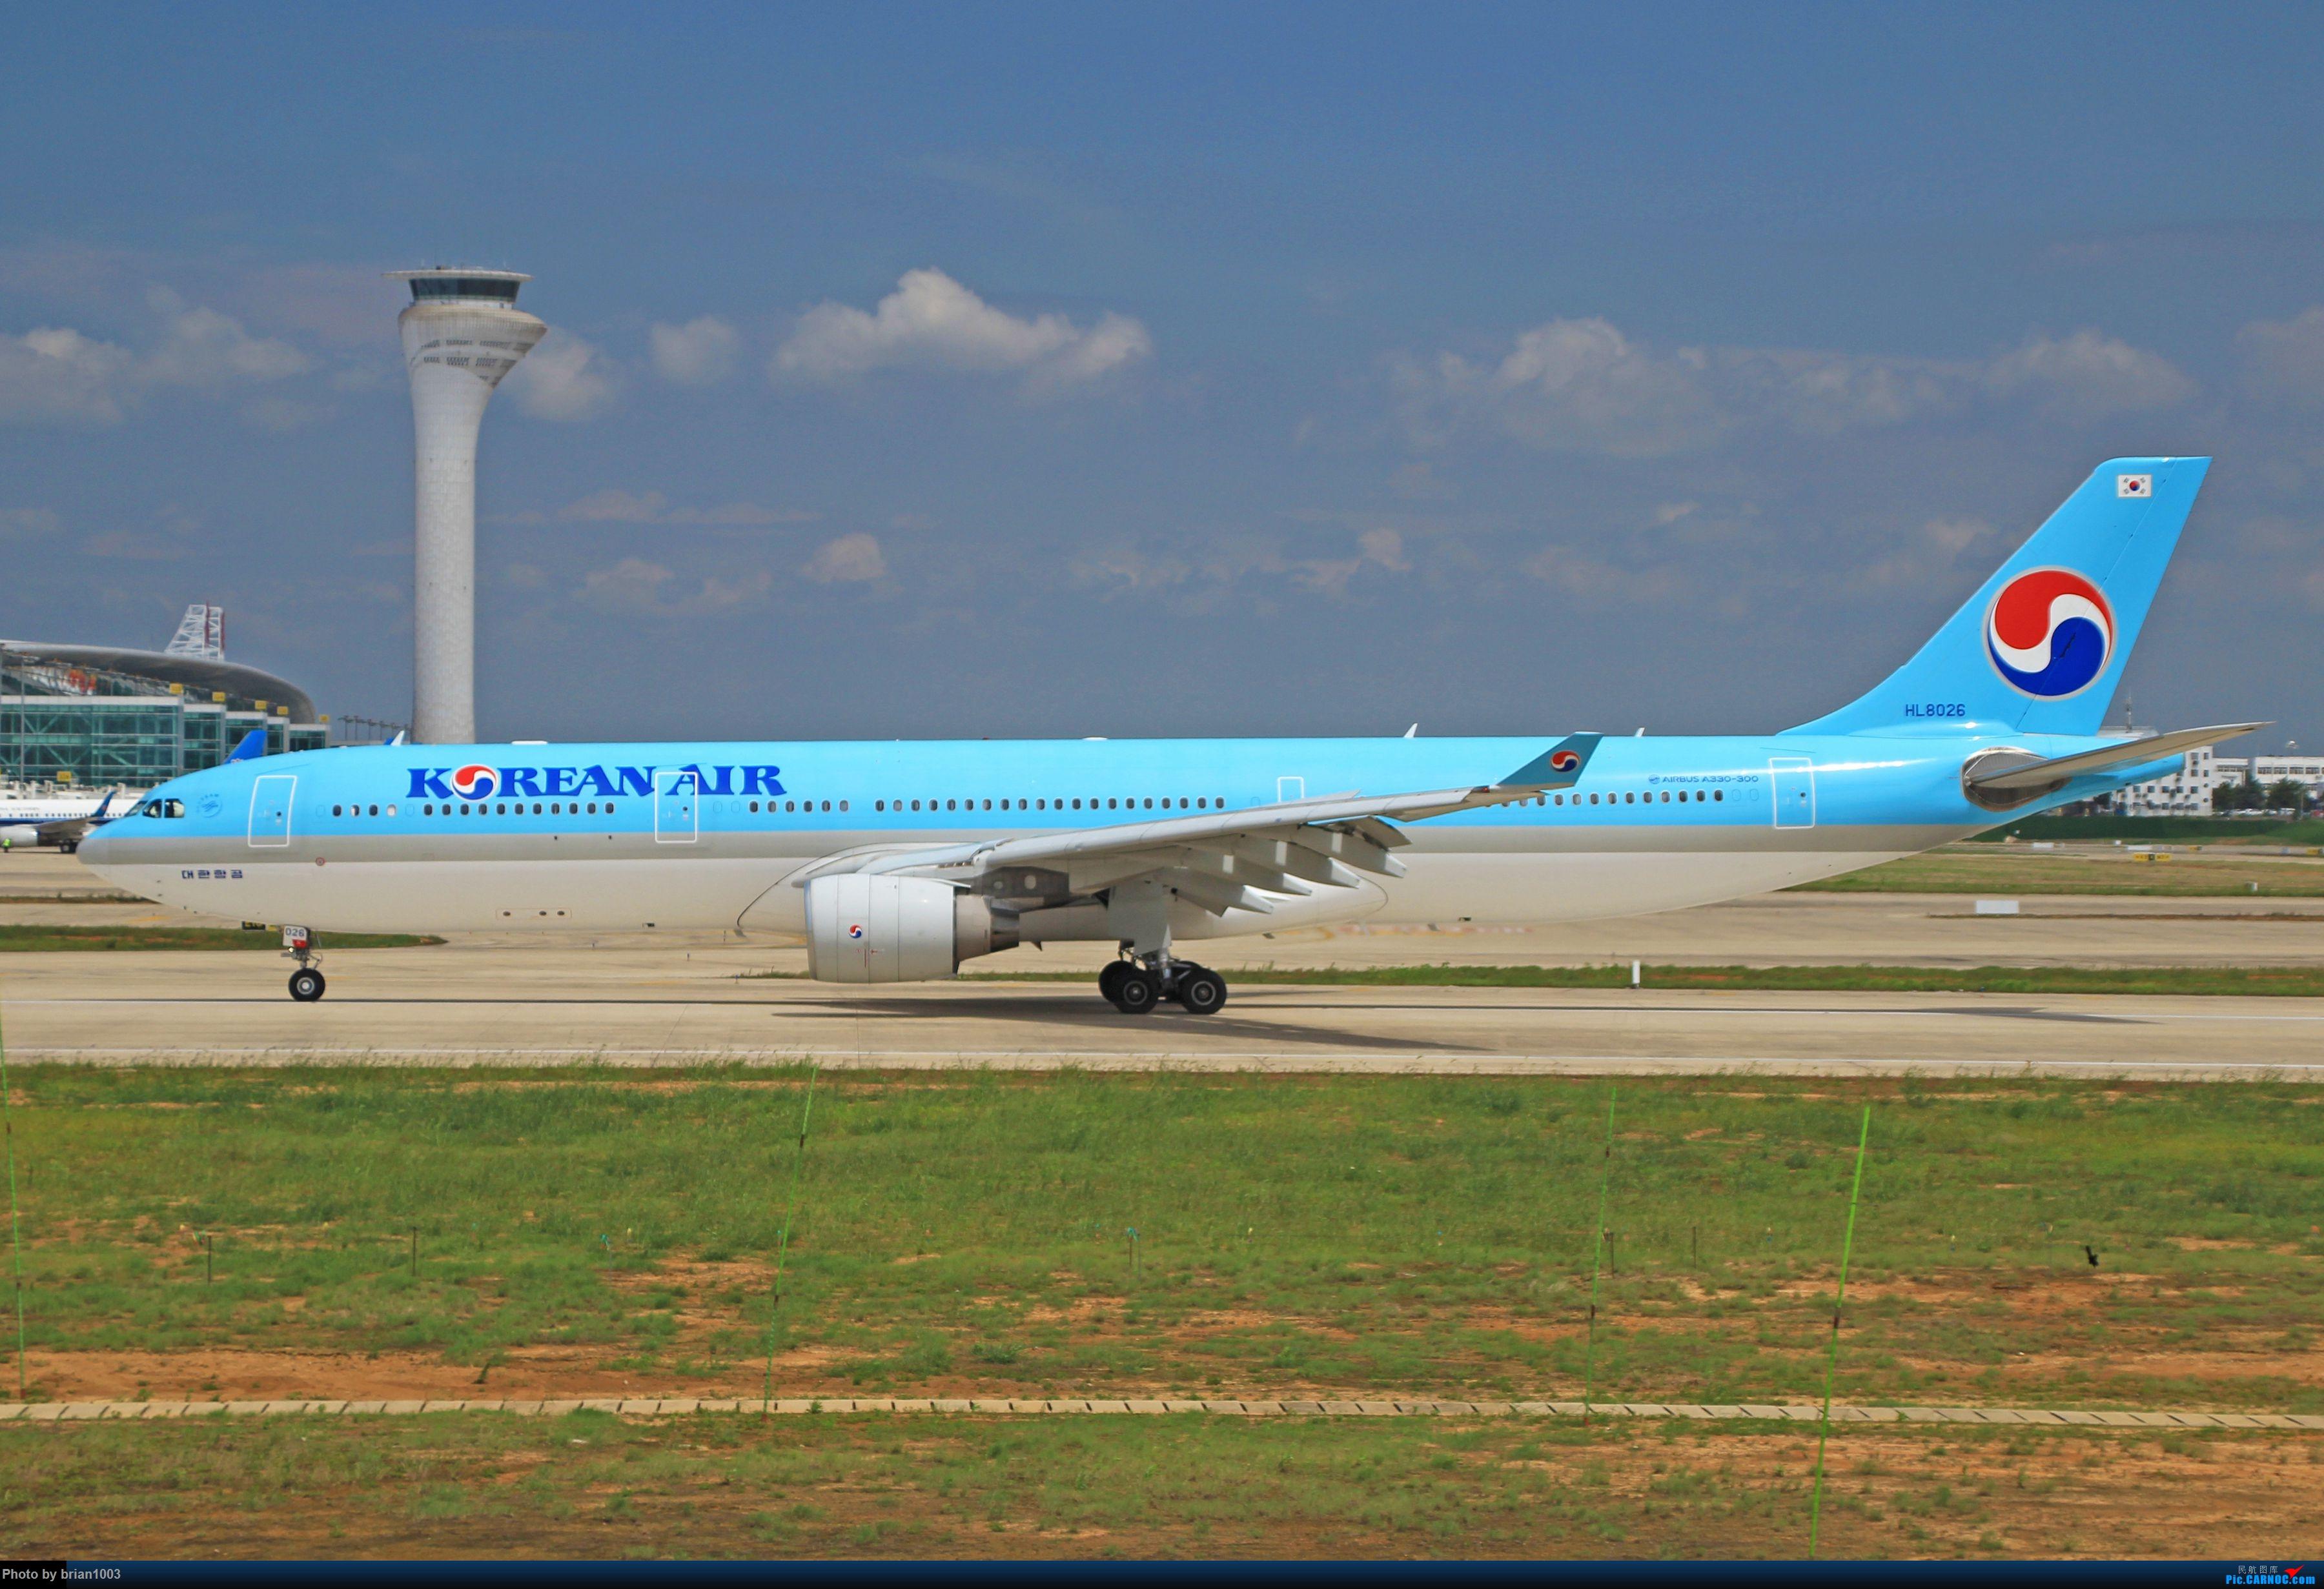 Re:[原创]WUH天河机场拍机之六月还有啥(X7家744F、天津大韩港龙333、巴基斯坦772、B6419) AIRBUS A330-300 HL8026 中国武汉天河国际机场